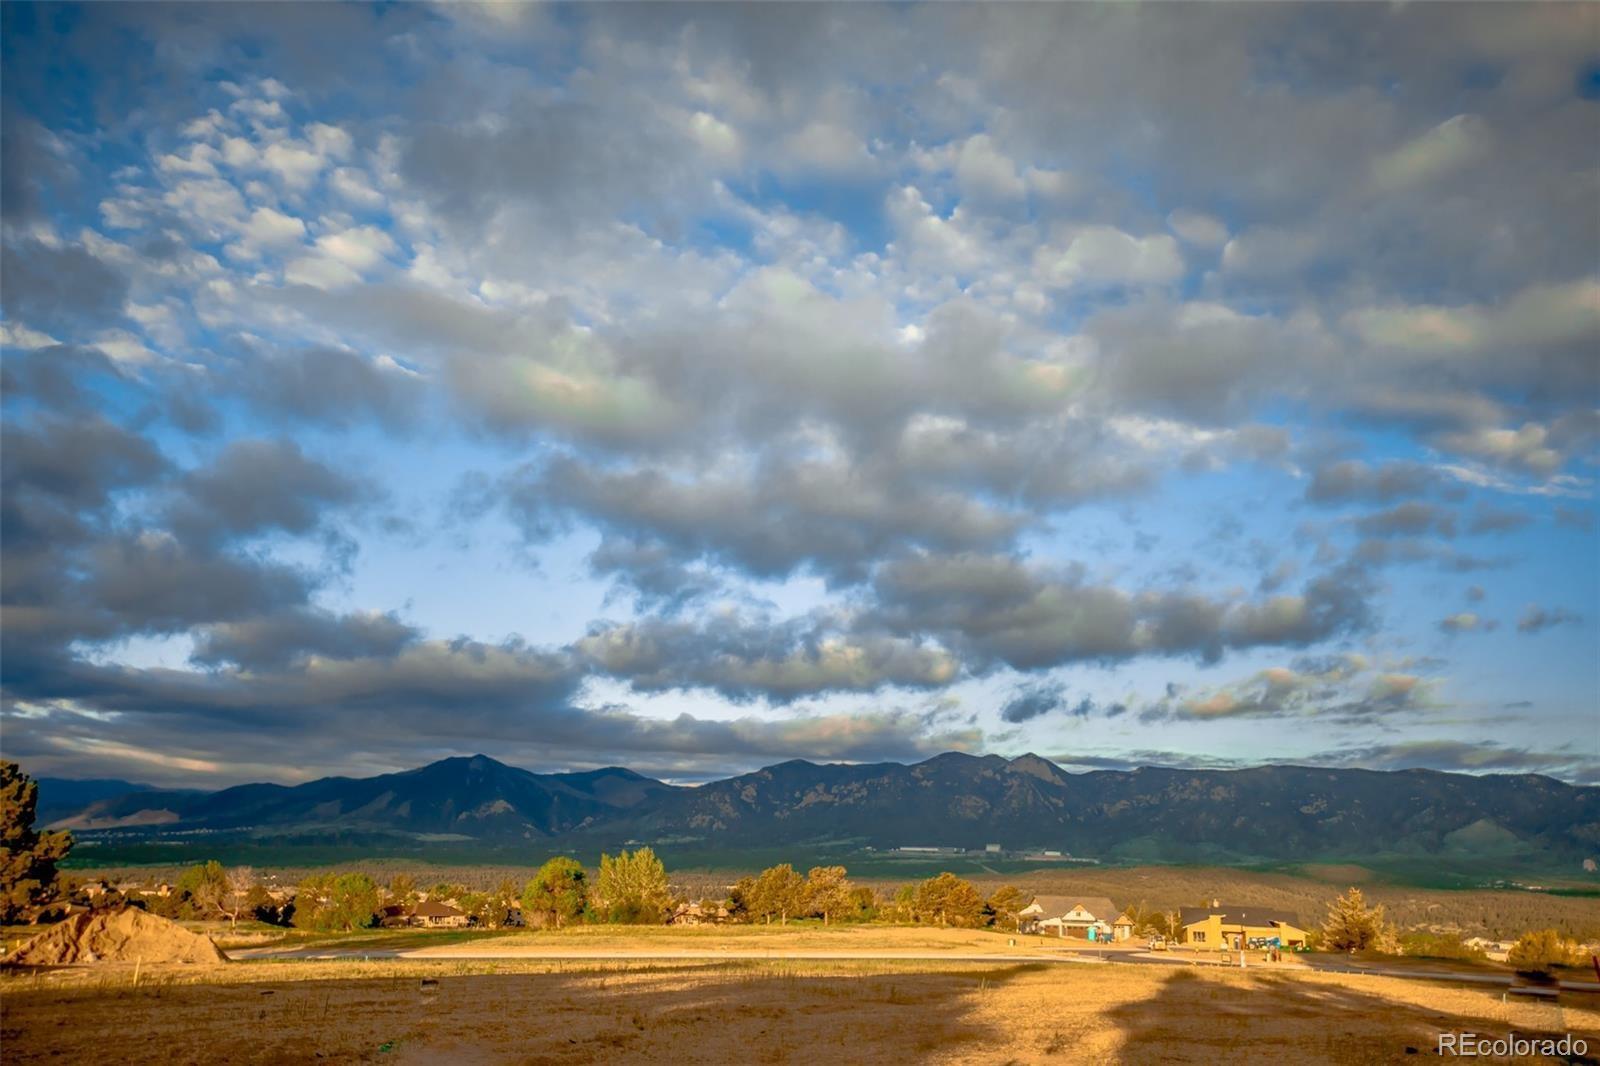 MLS# 6078681 - 1 - 375 Mission Hill Way, Colorado Springs, CO 80921